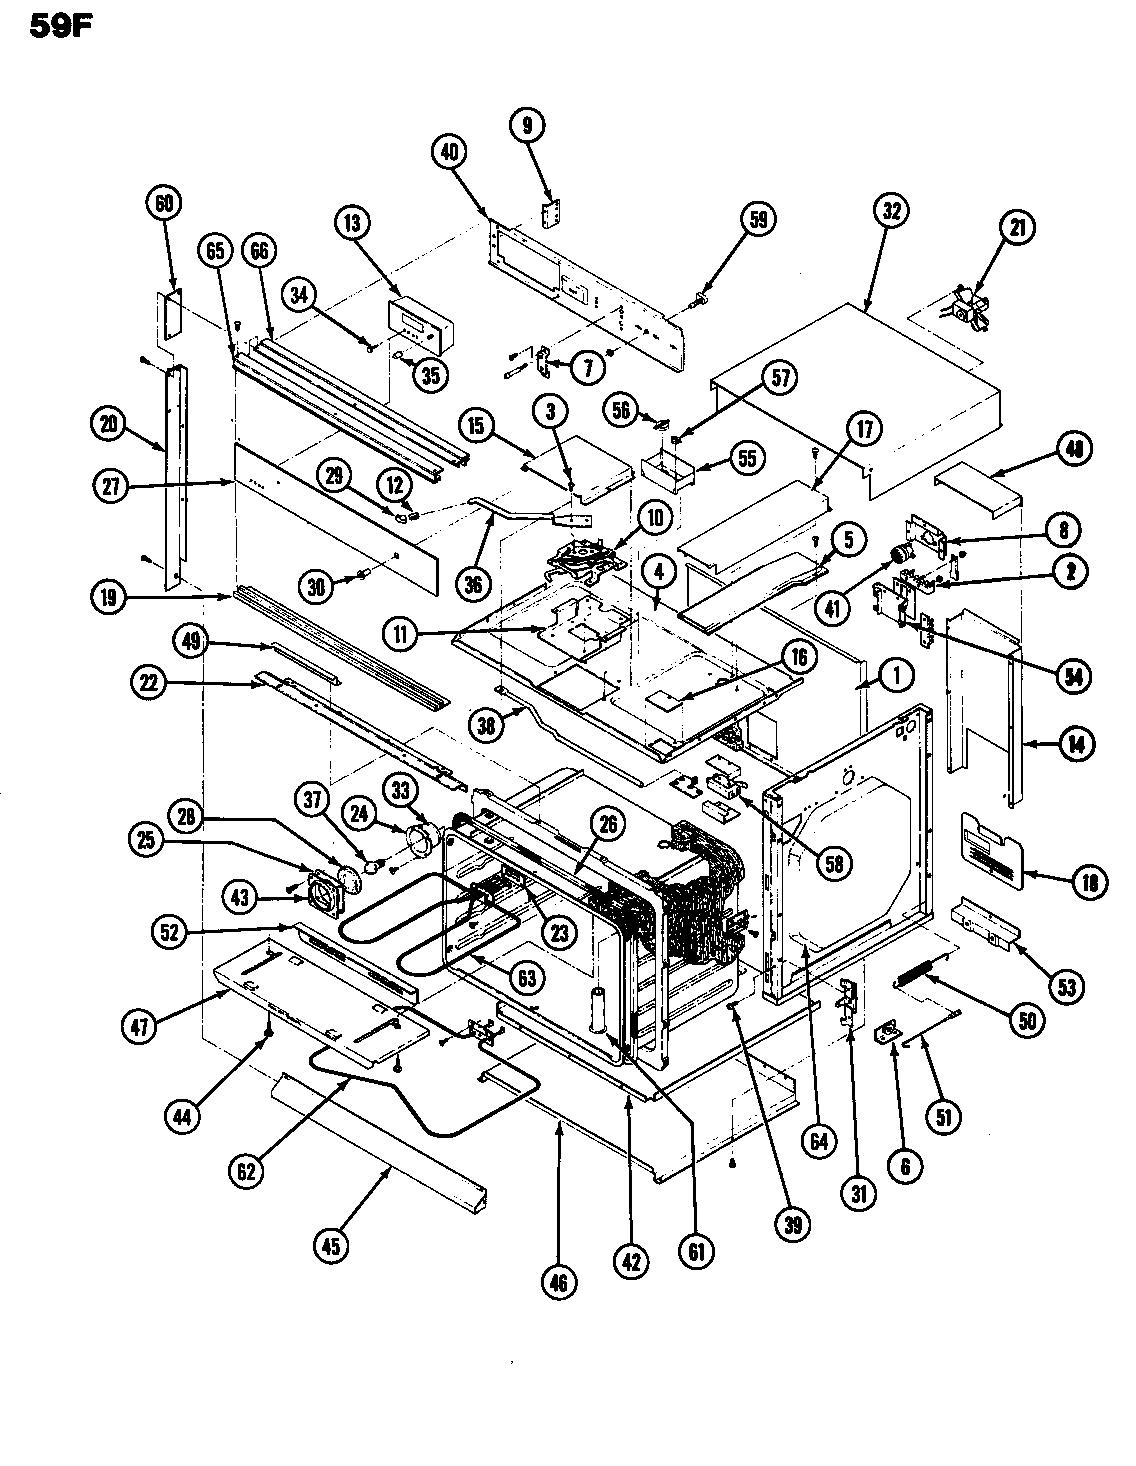 Mini Refrigerator Wiring Diagram Schematic Diagrams Budweiser Fridge Magic Chef Freezer Automotive U2022 Danby Diplomat